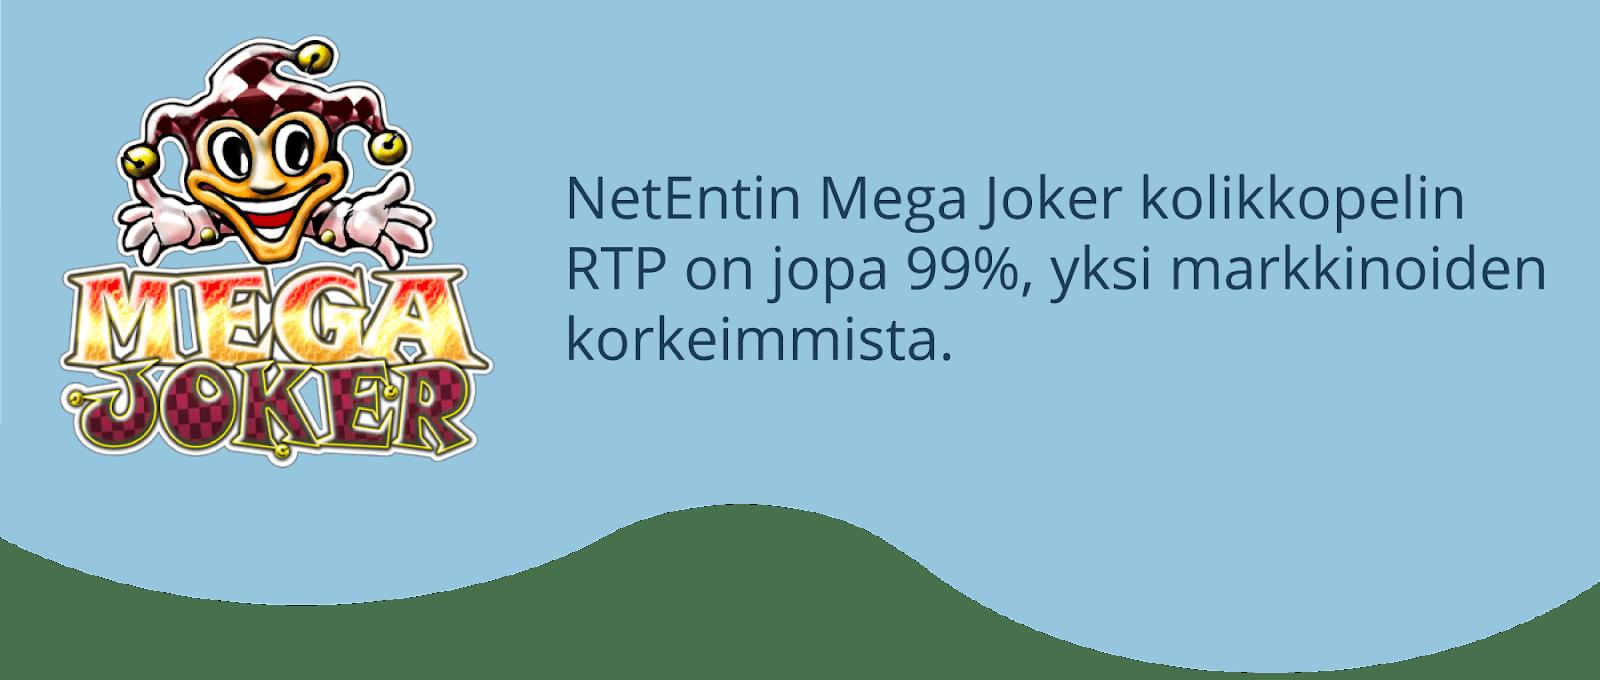 MegaJoker RTP